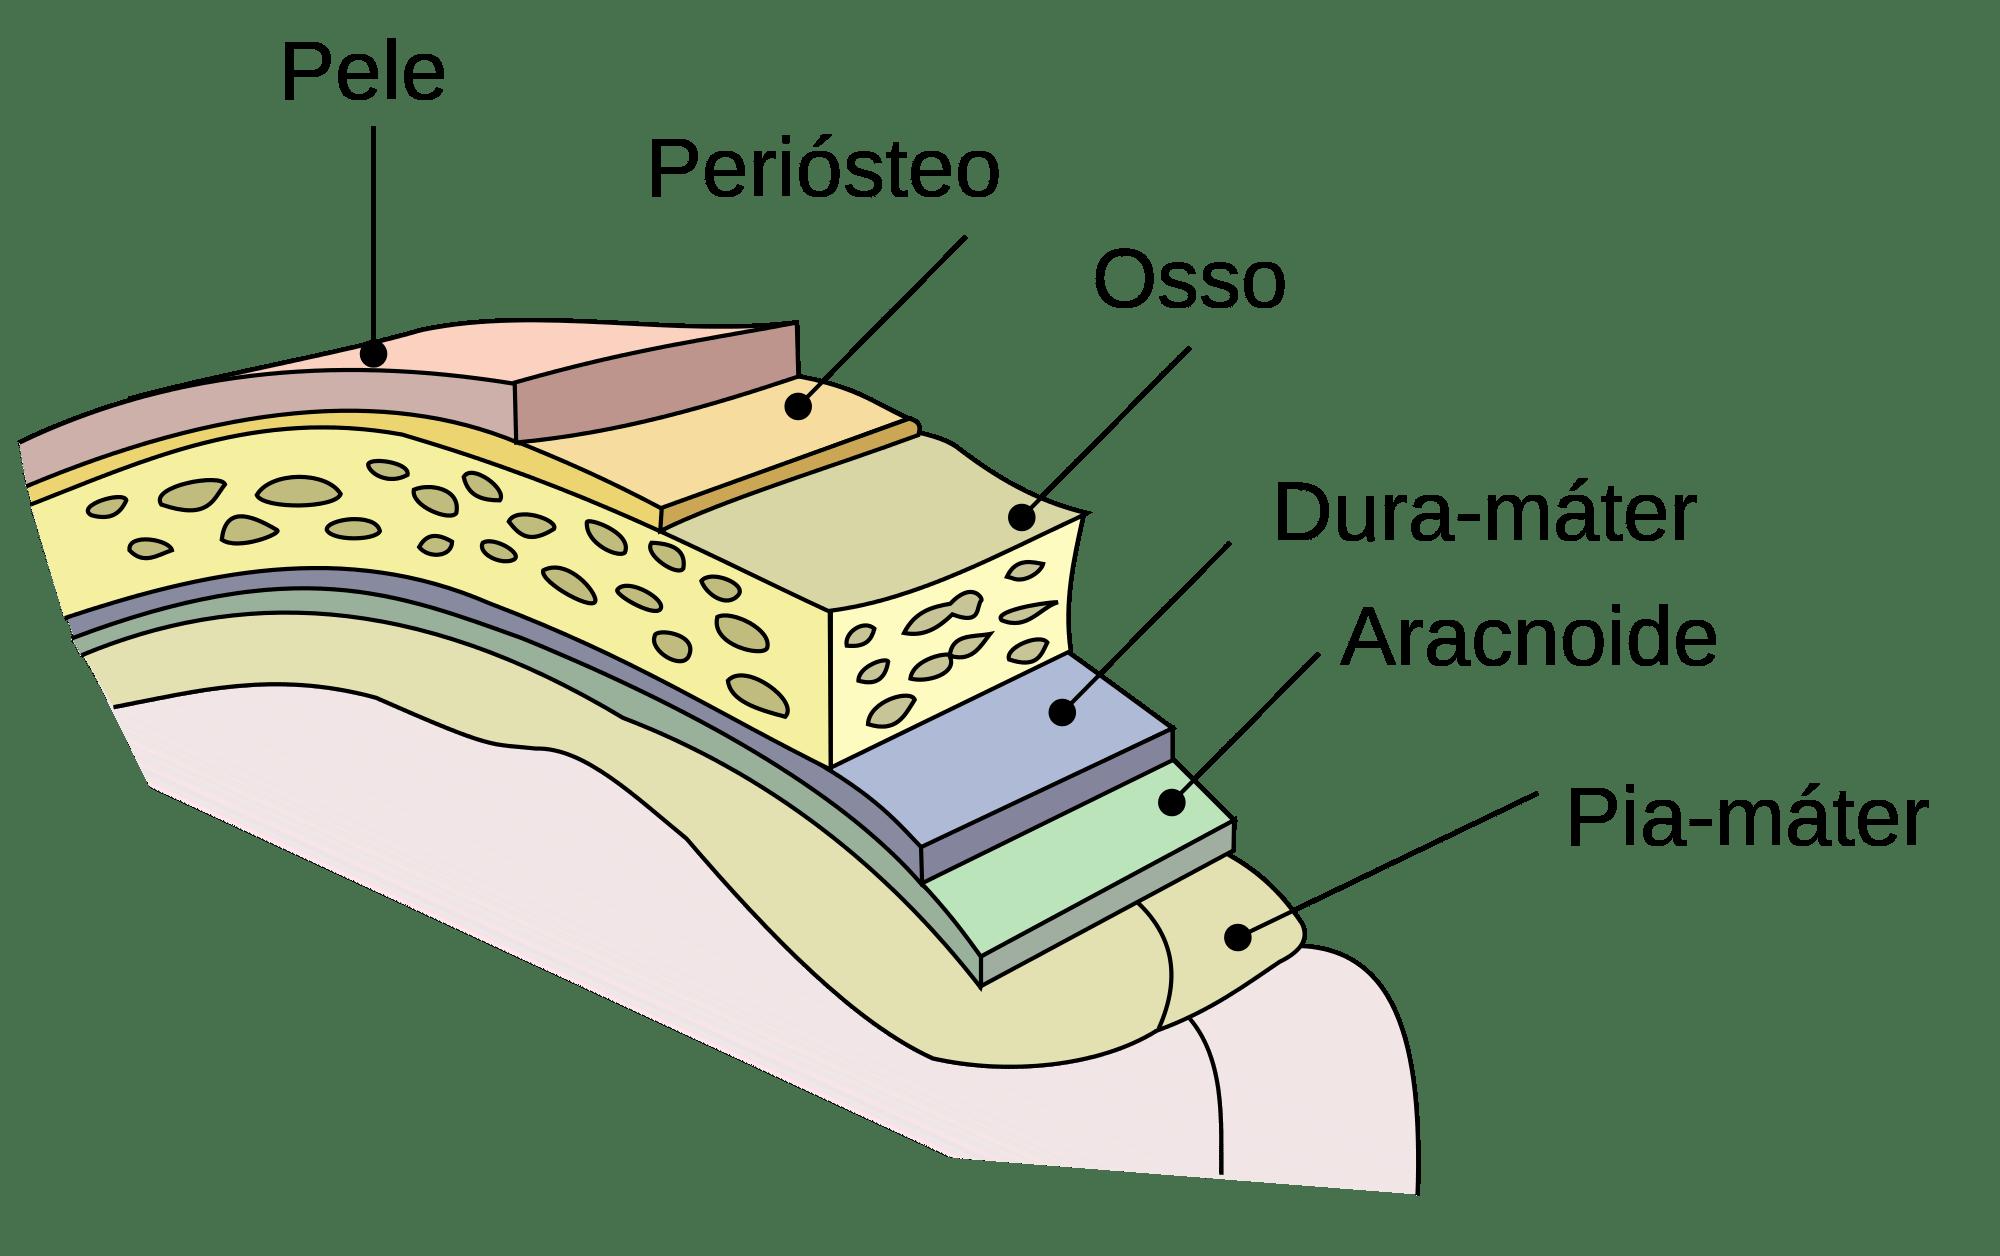 fetal pig nervous system diagram hockey rink a neuroanatomia do revestimento cerebral